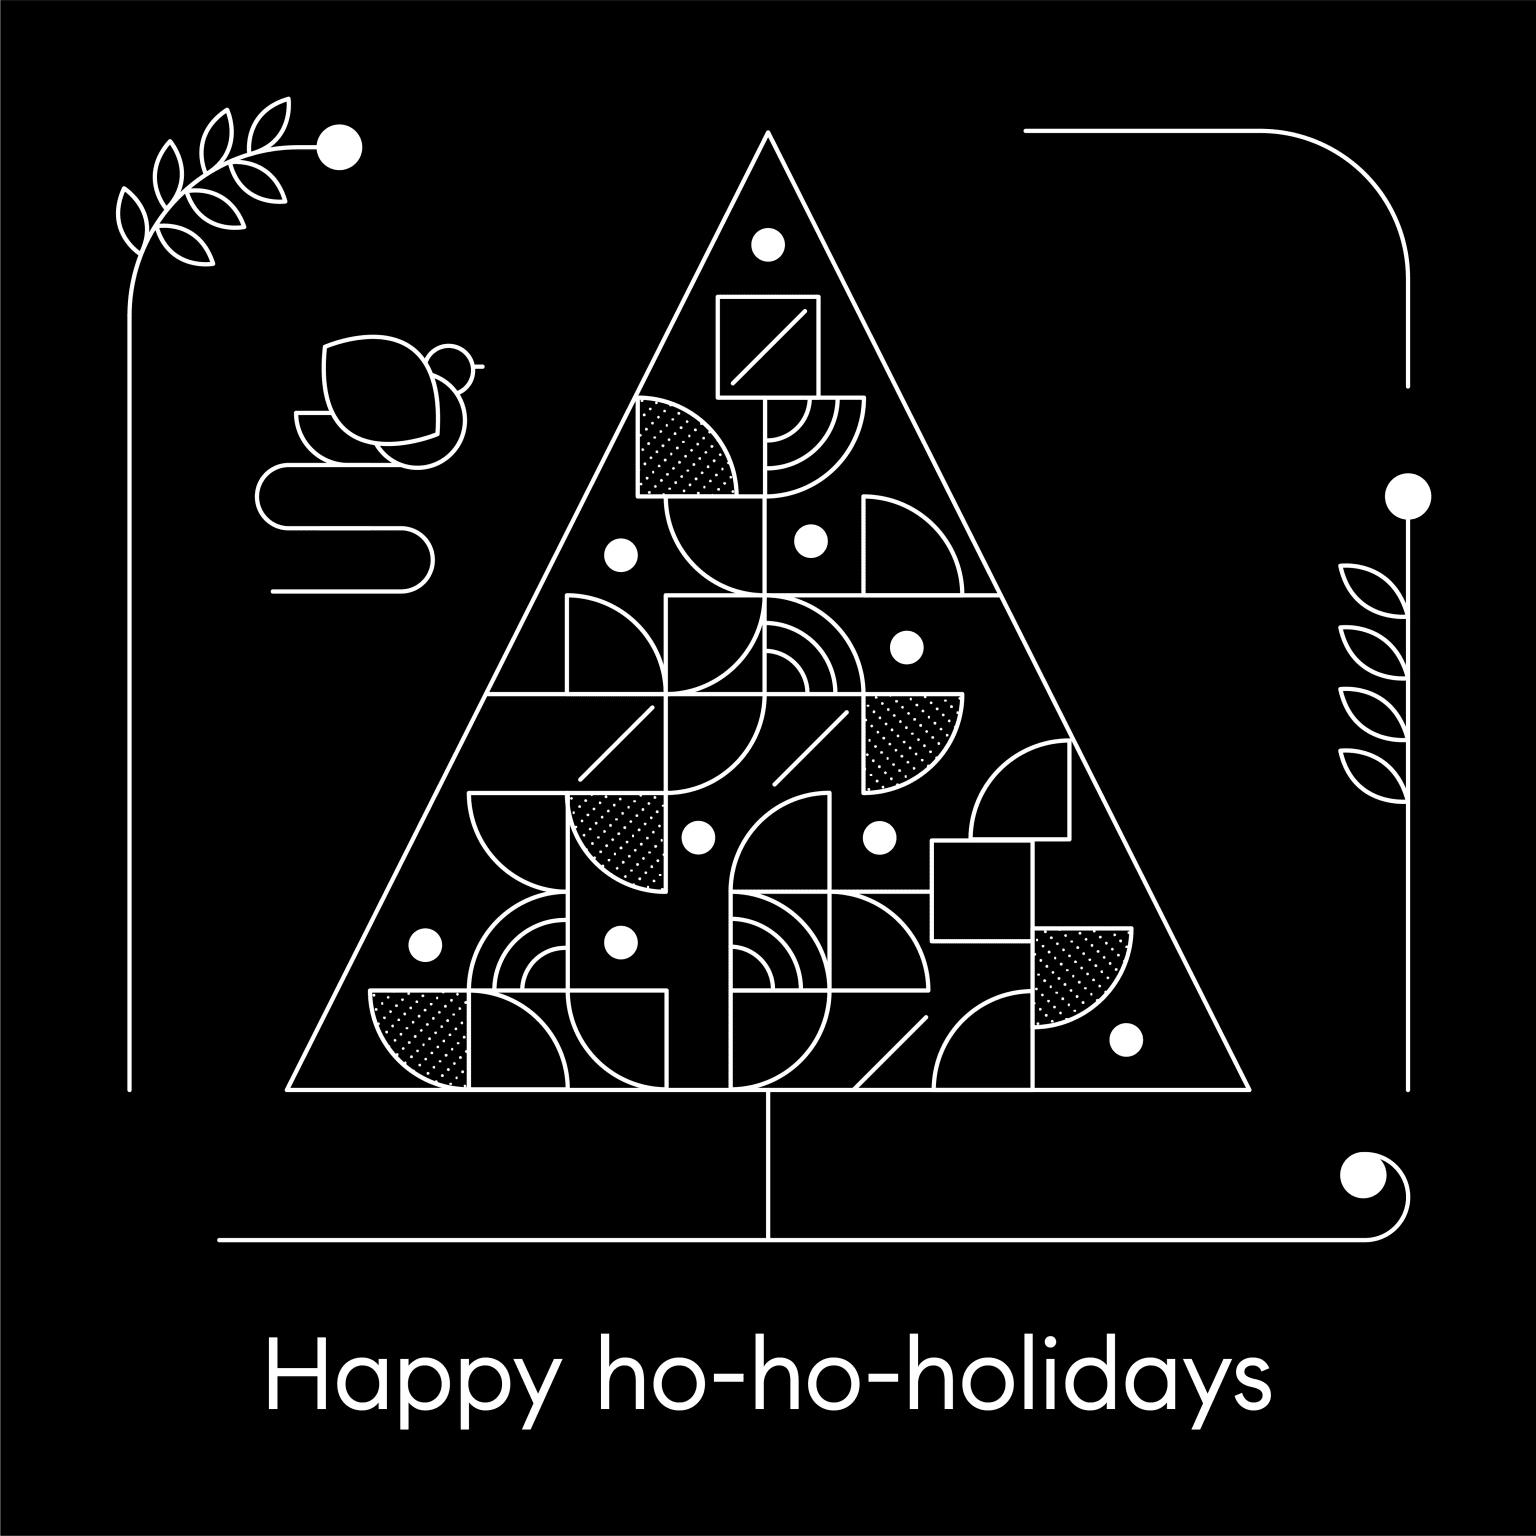 Compass Holiday Illustrations